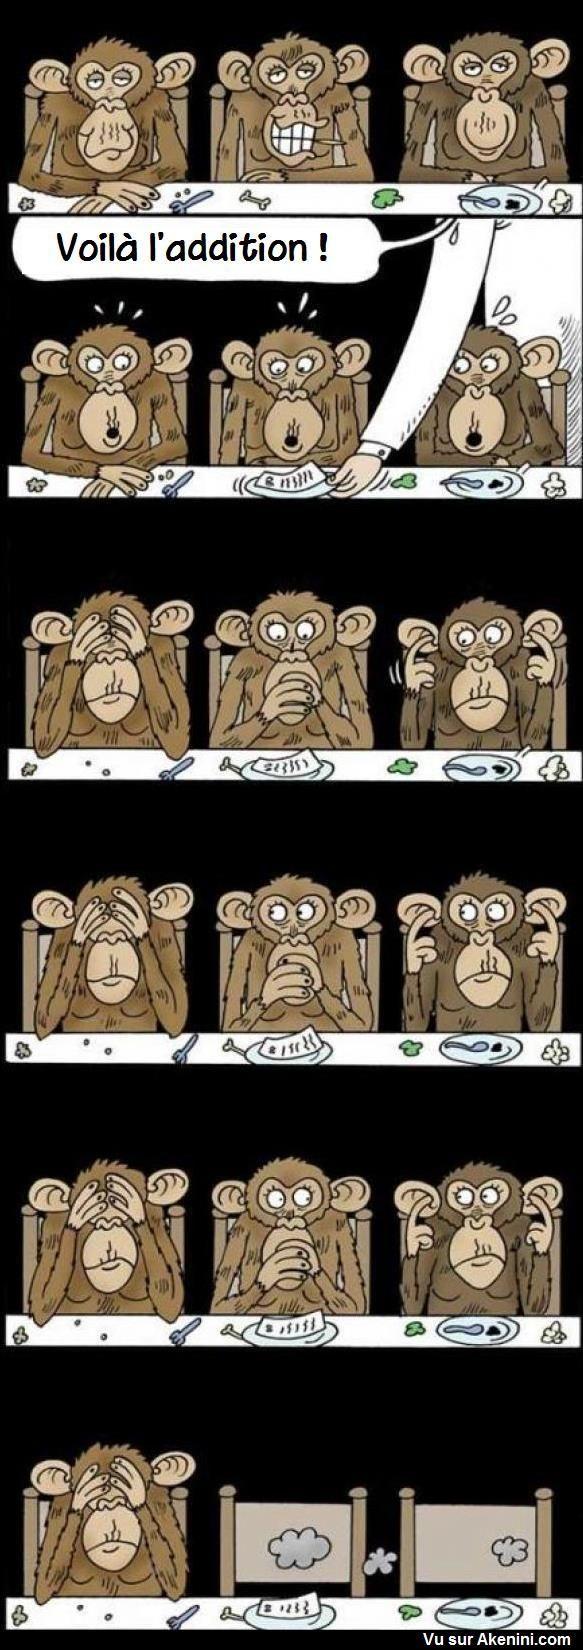 Akenini.com - Images drôles Bandes dessinées - Funny comics